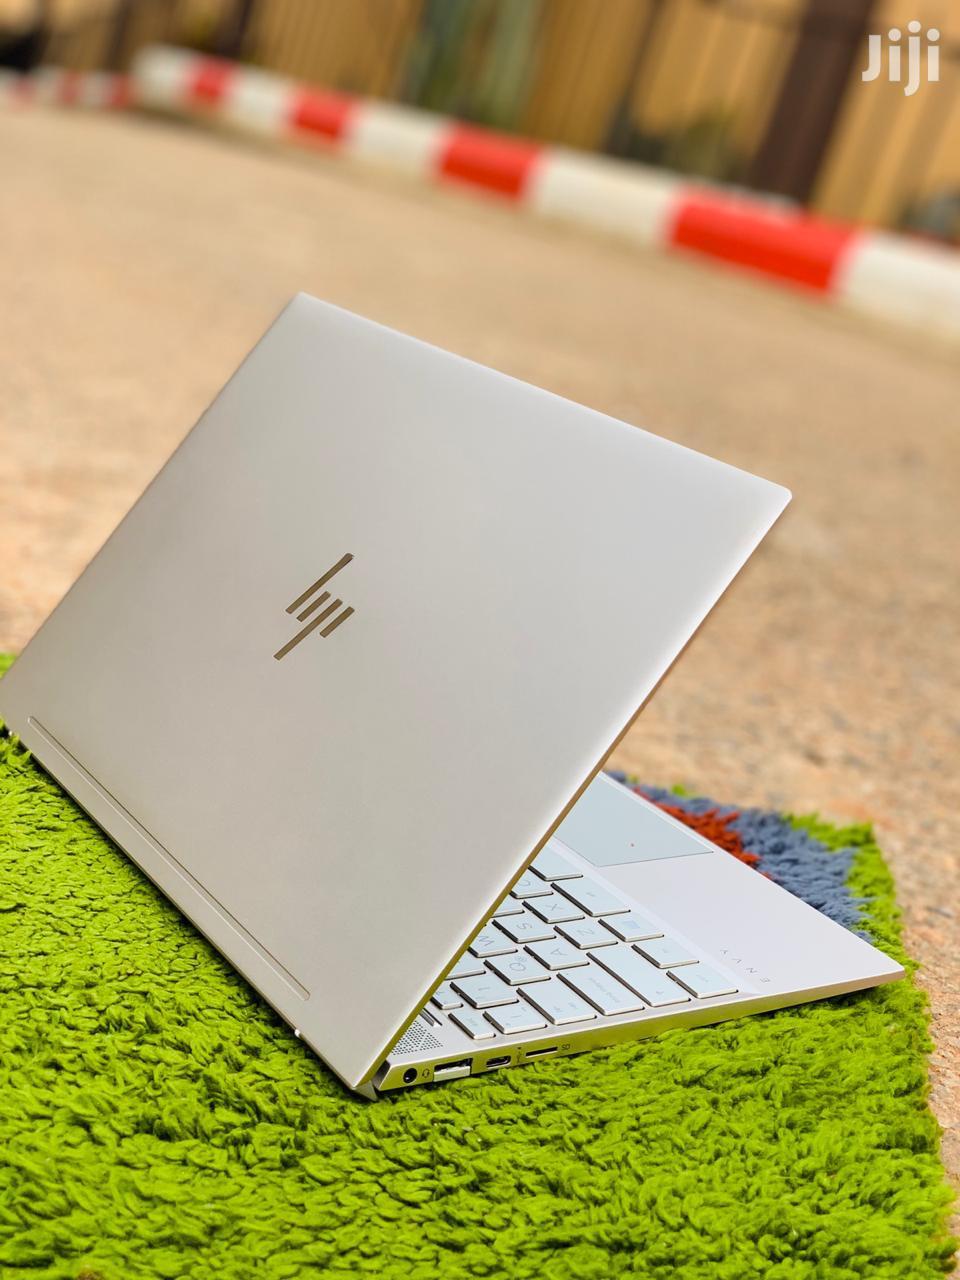 New Laptop HP Envy 13 8GB Intel Core i5 SSD 256GB